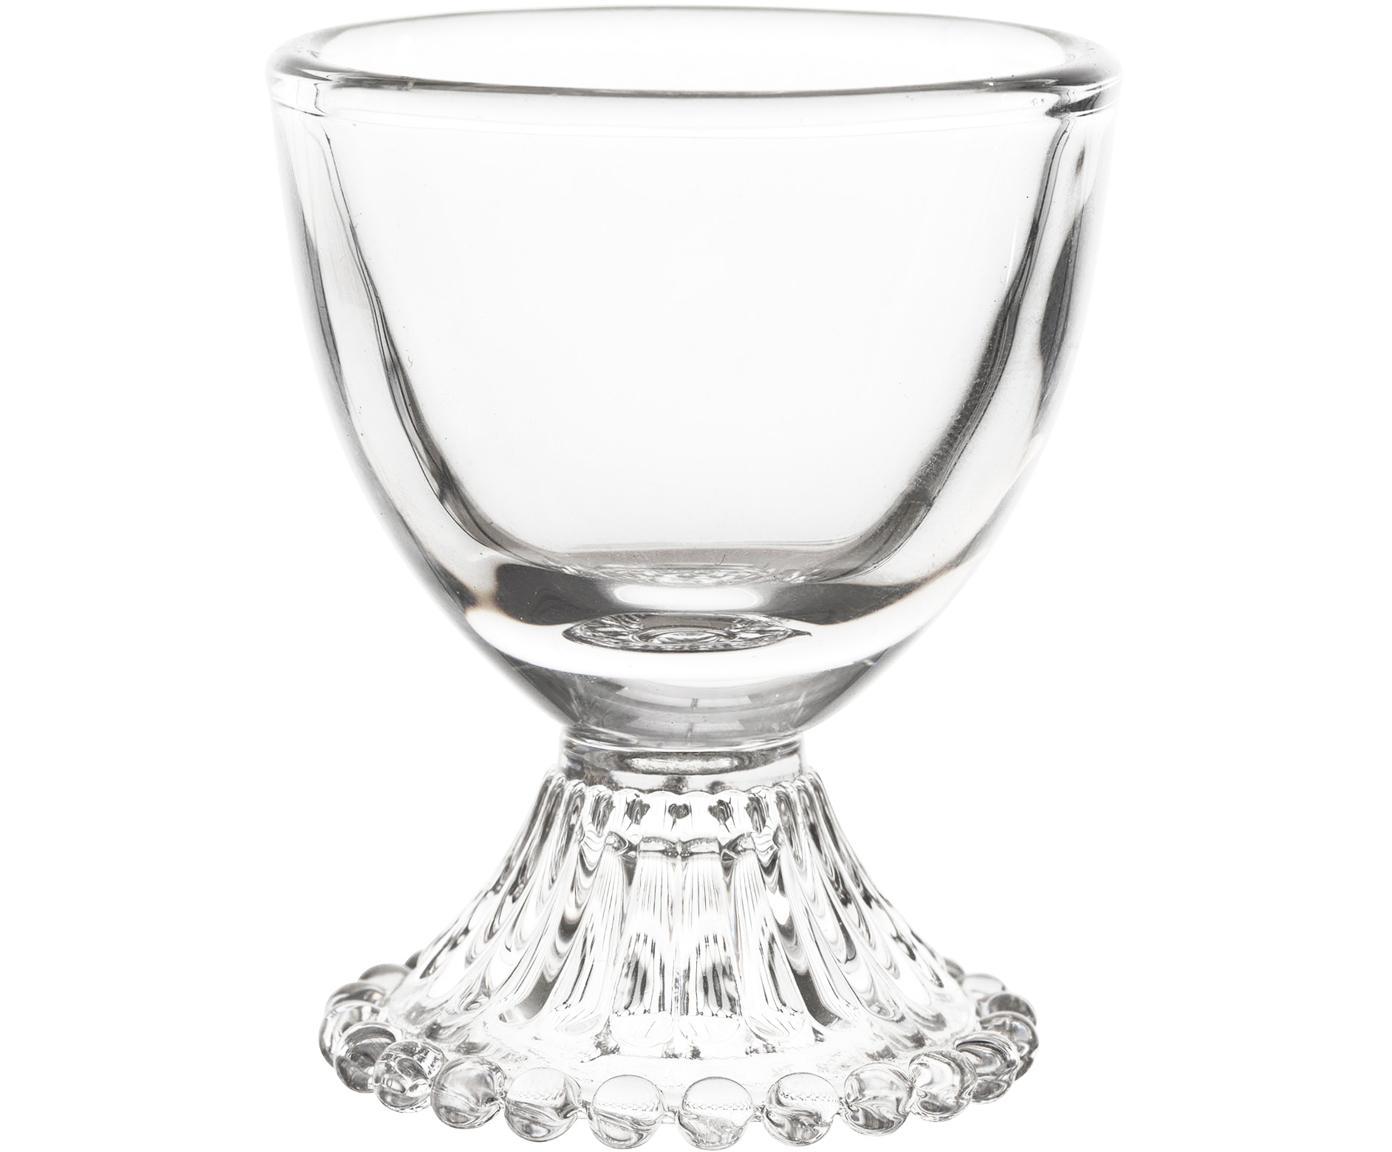 Soporte de huevo Perles, 6 uds., Vidrio, Transparente, Ø 6 x Al 7 cm